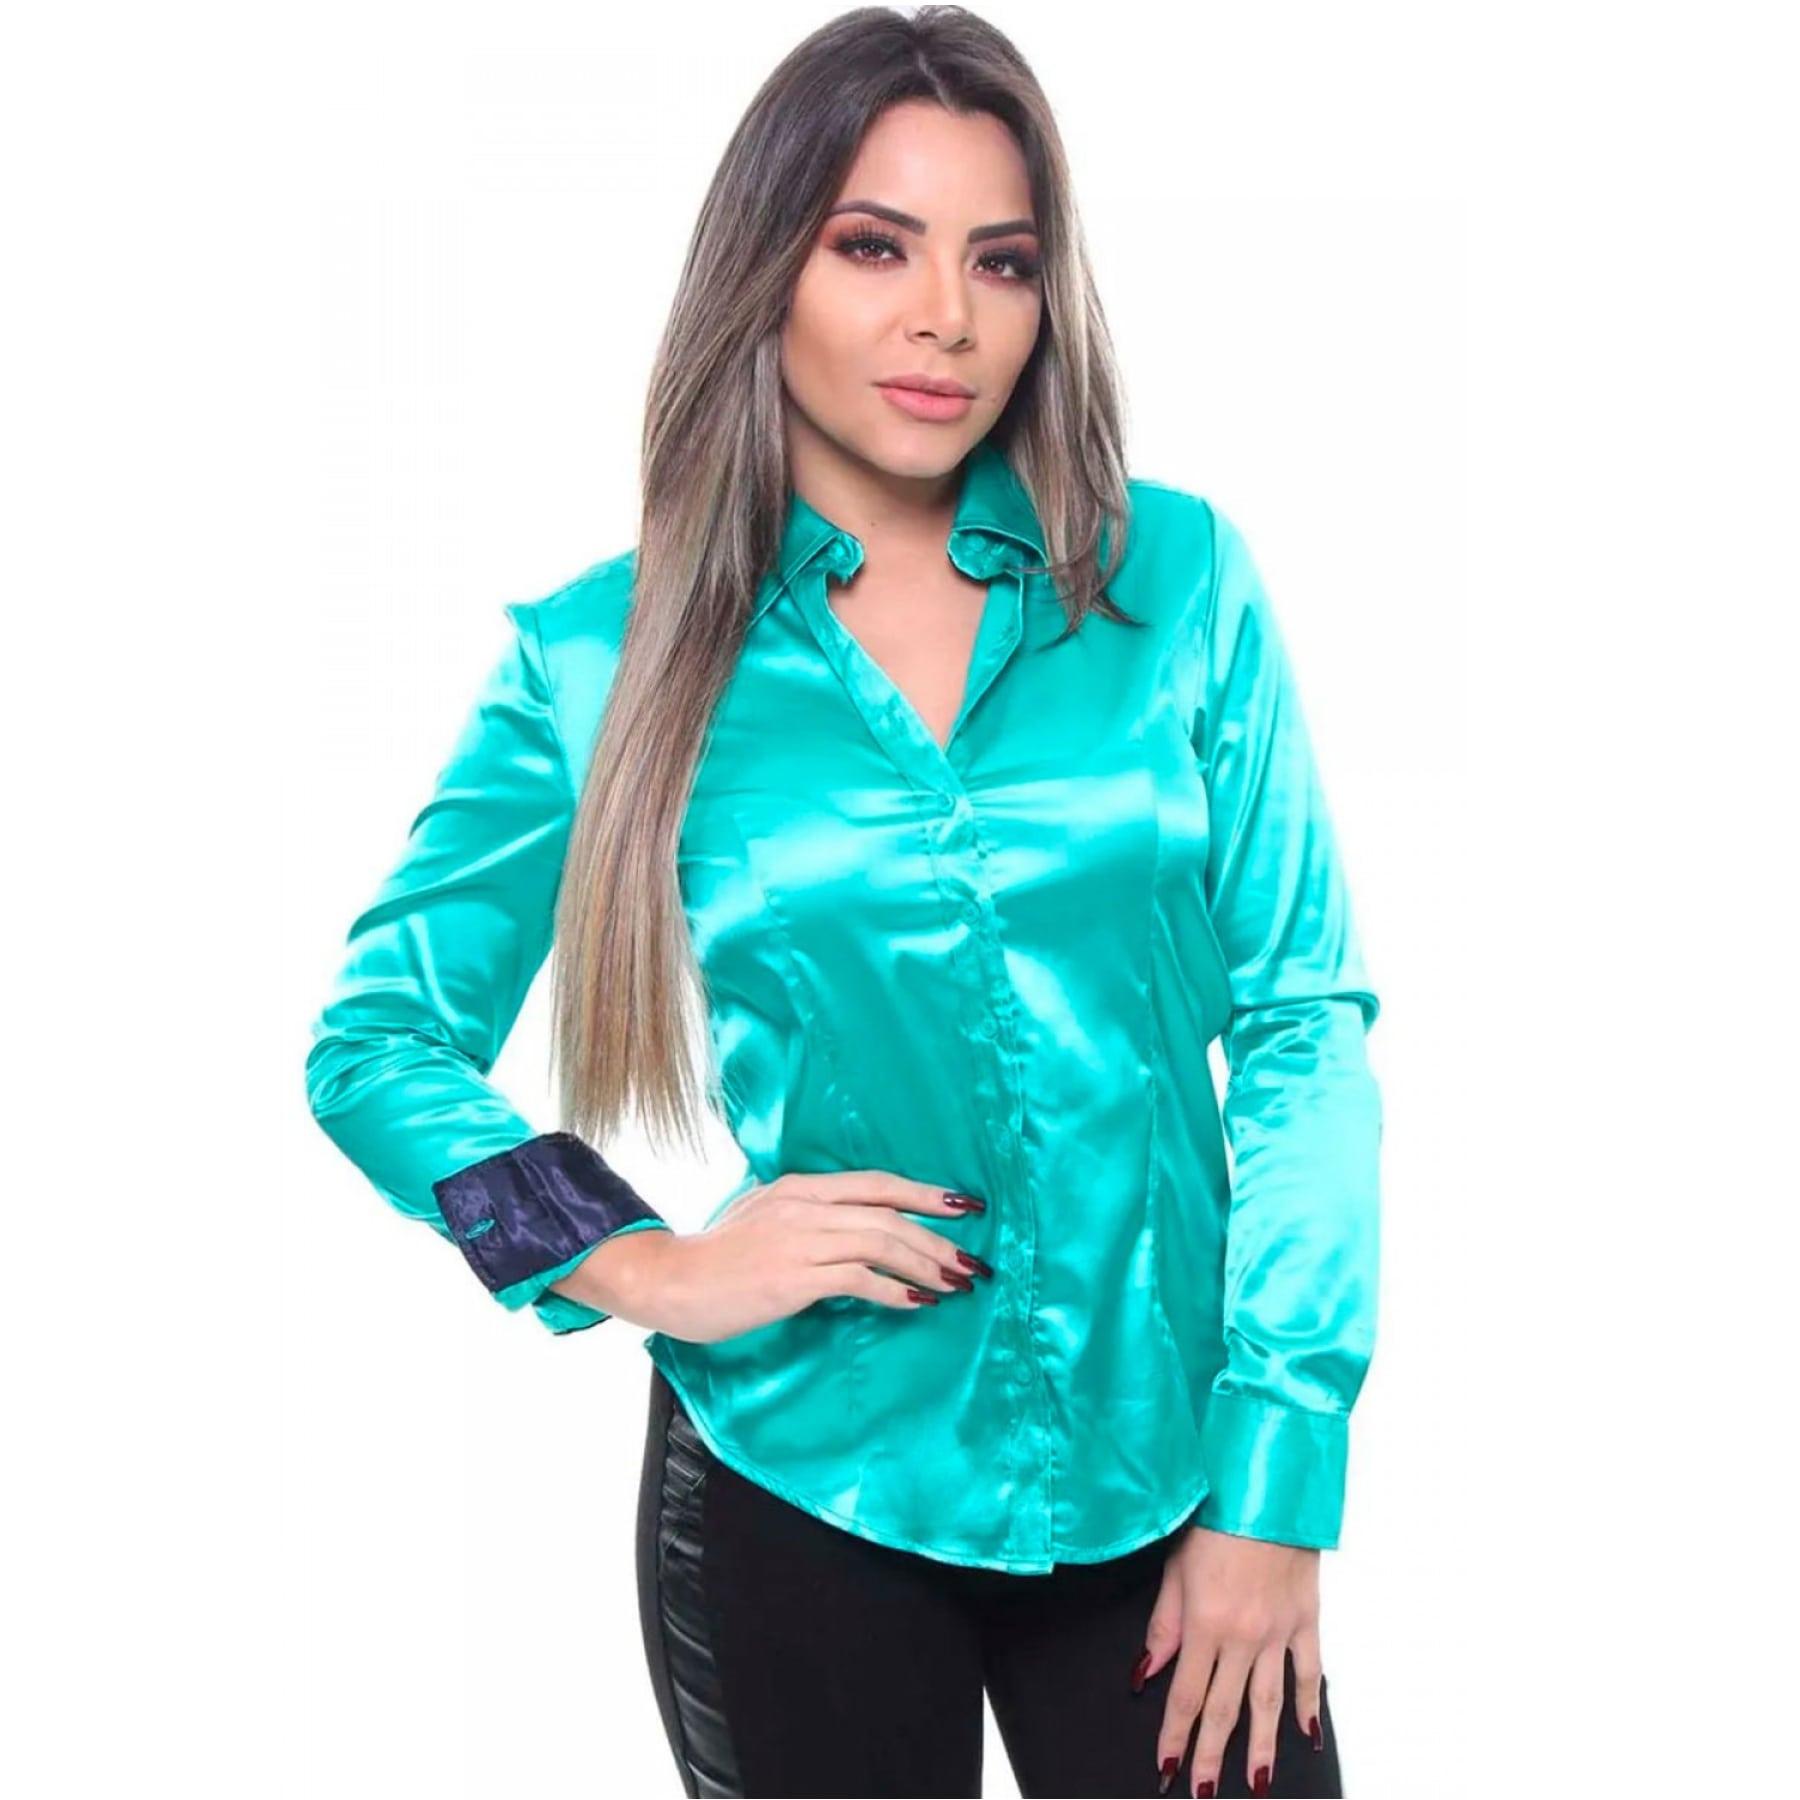 Camisa Feminina De Cetim Manga Longa Cor Verde Agua